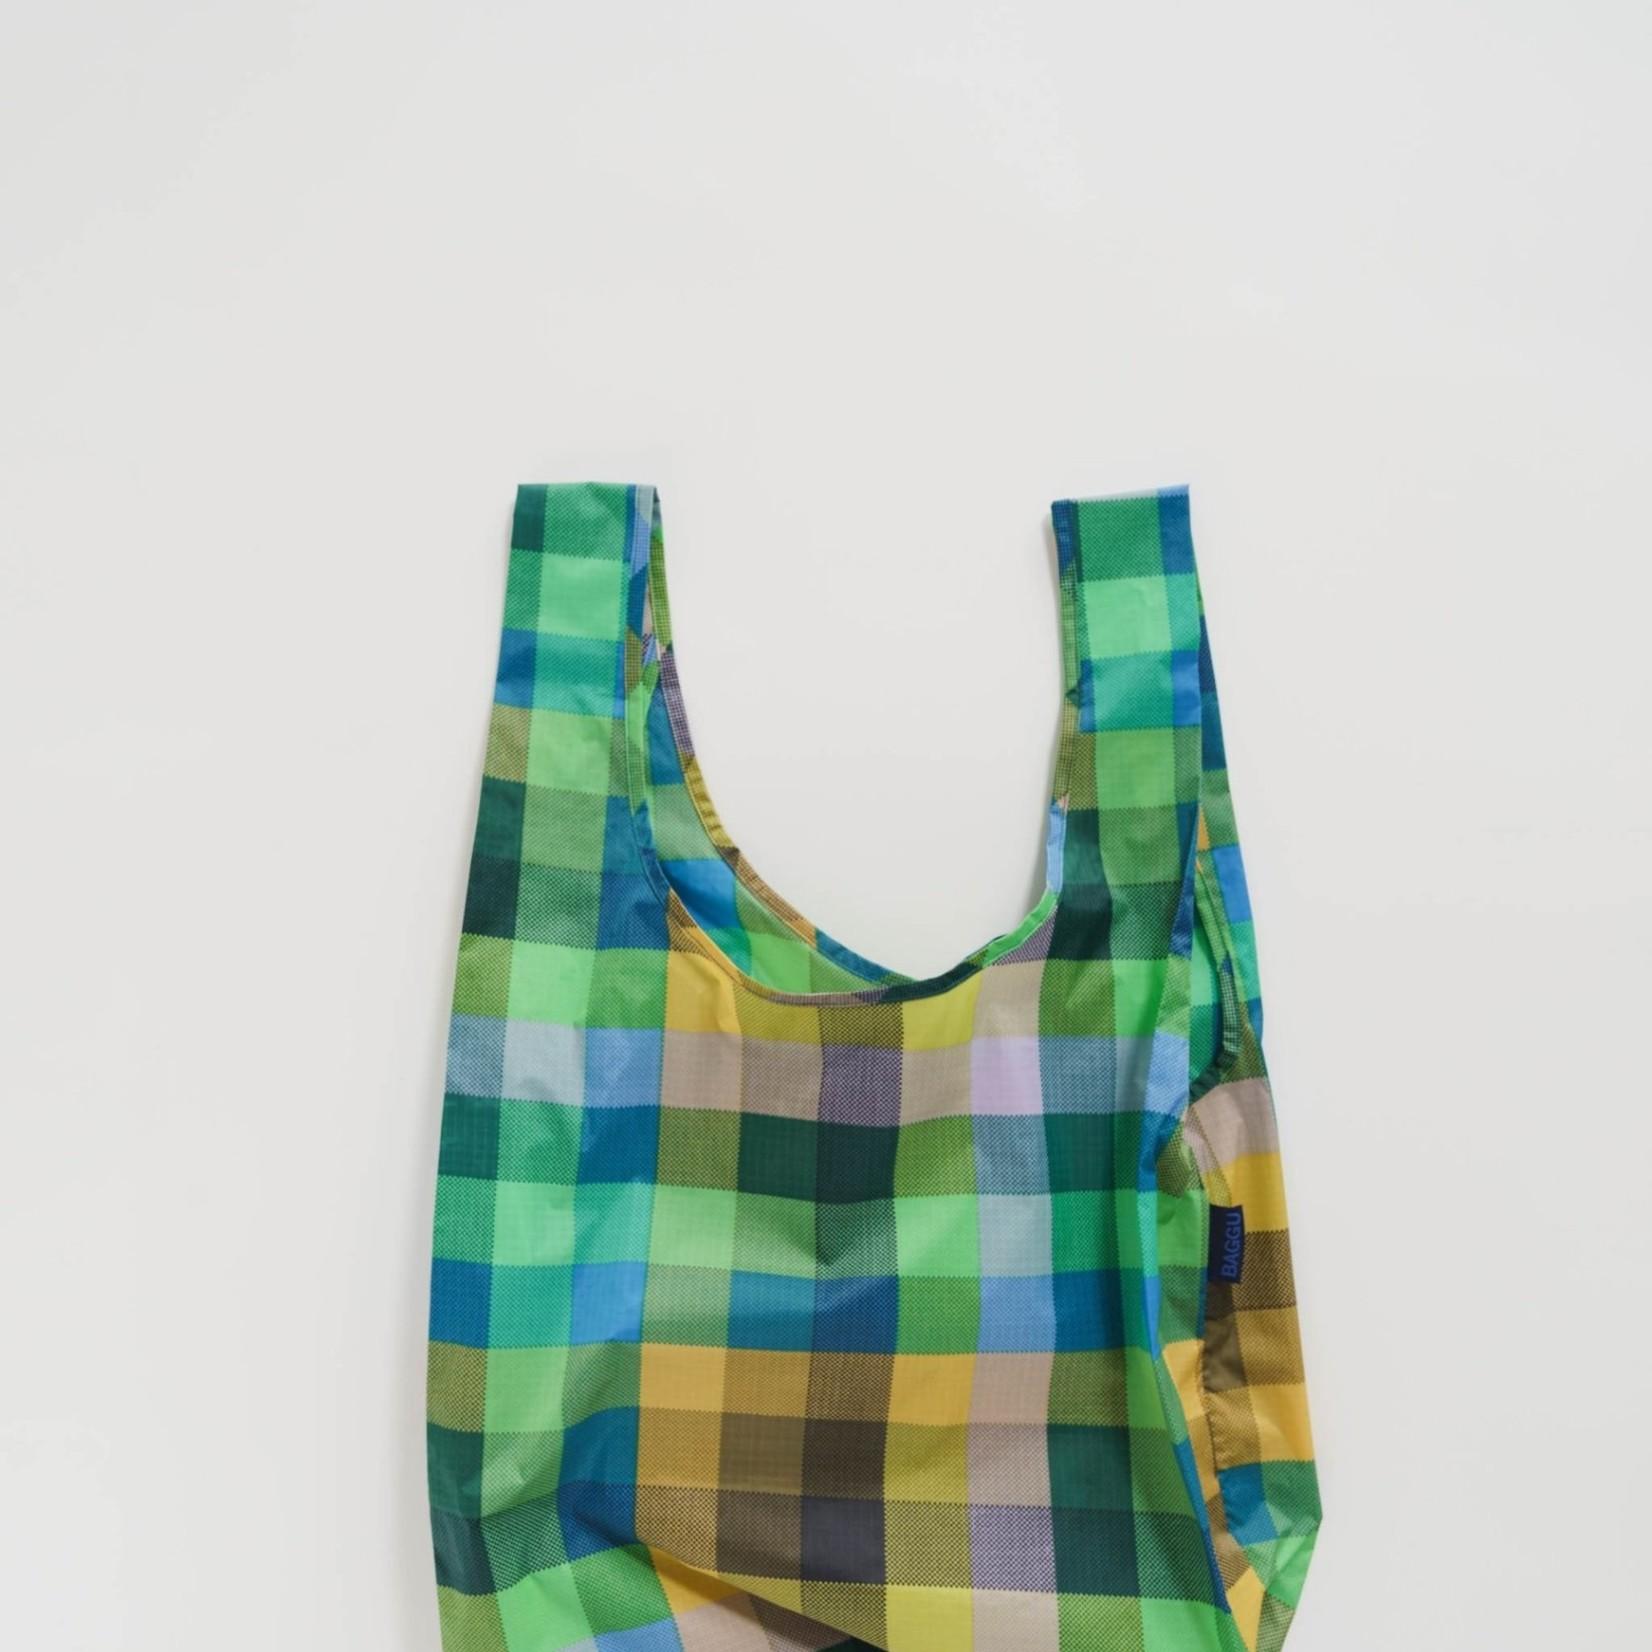 Baggu Baggu Reusable Bag Standard Madras No. 3